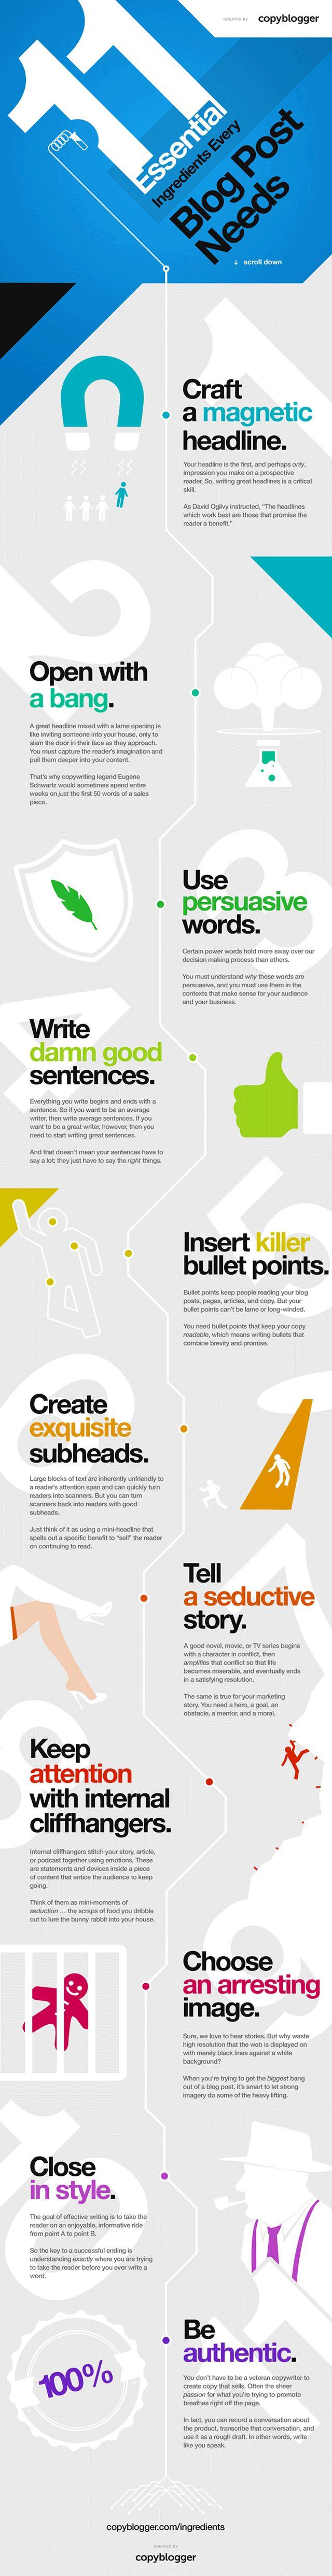 essential-blog-post-ingredients-infographic